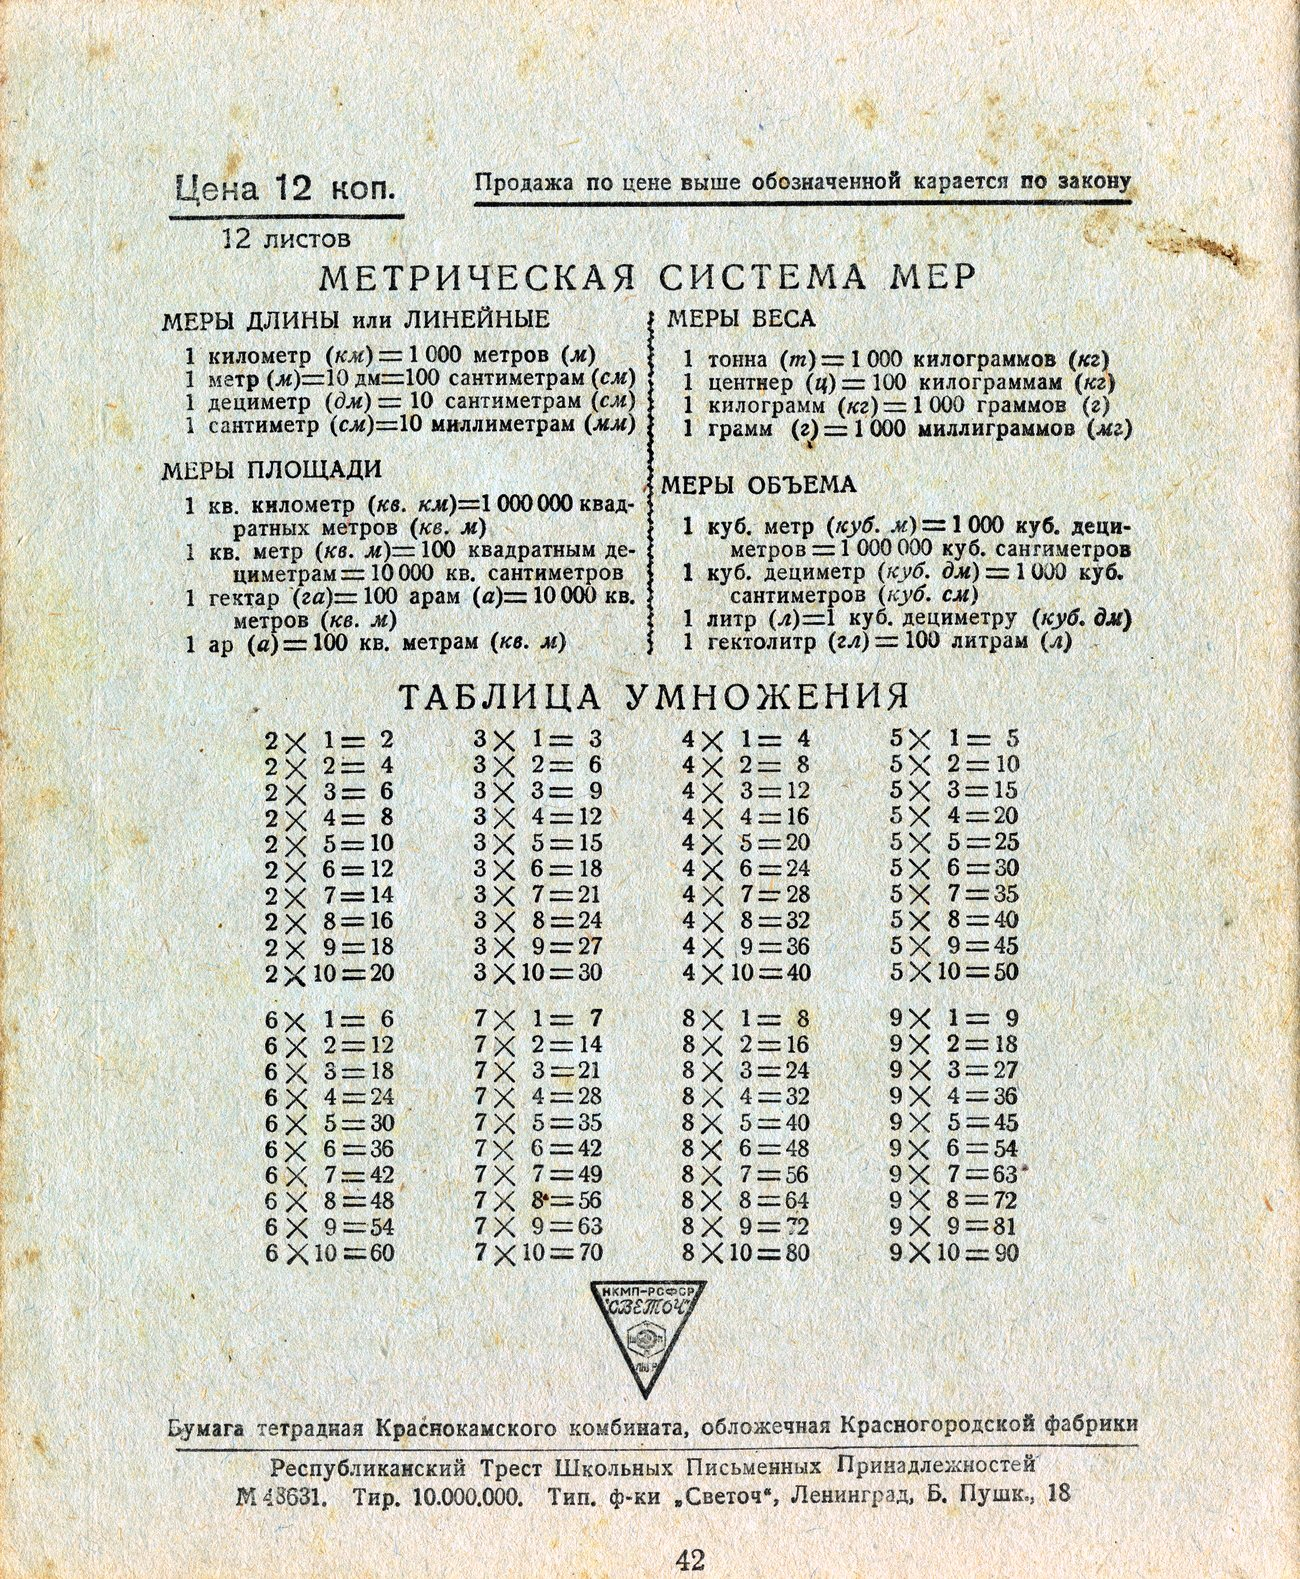 Тетрадь СССР, Чапаев, оборот